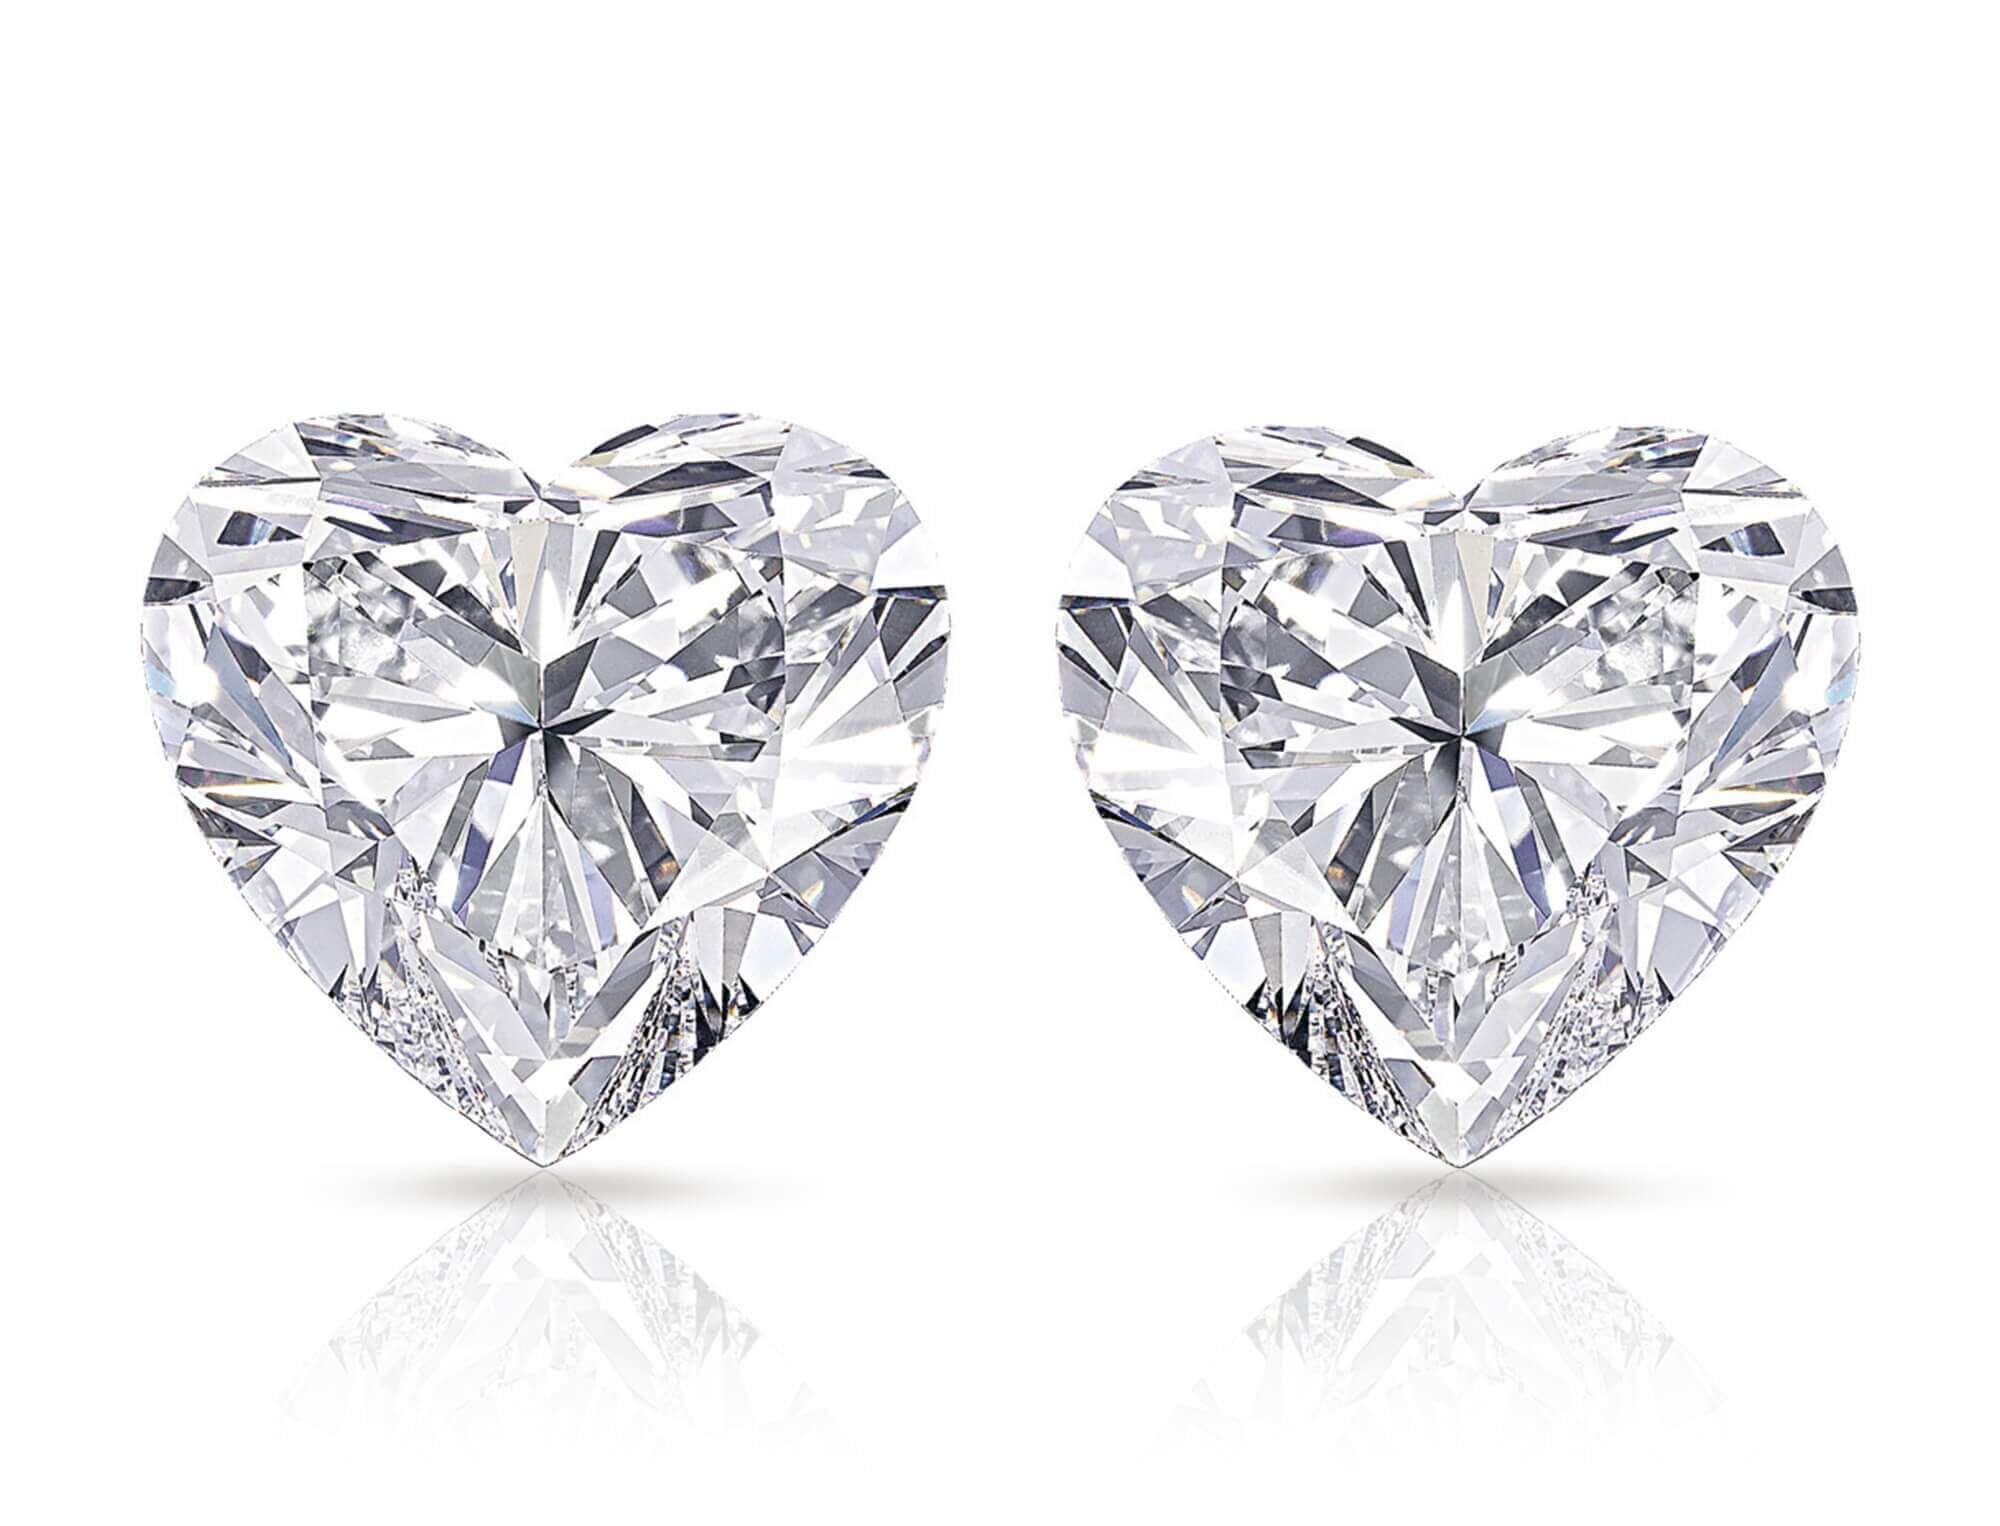 The Graff Sweethearts - 51.53 and 50.76 carat heart shape famous diamonds